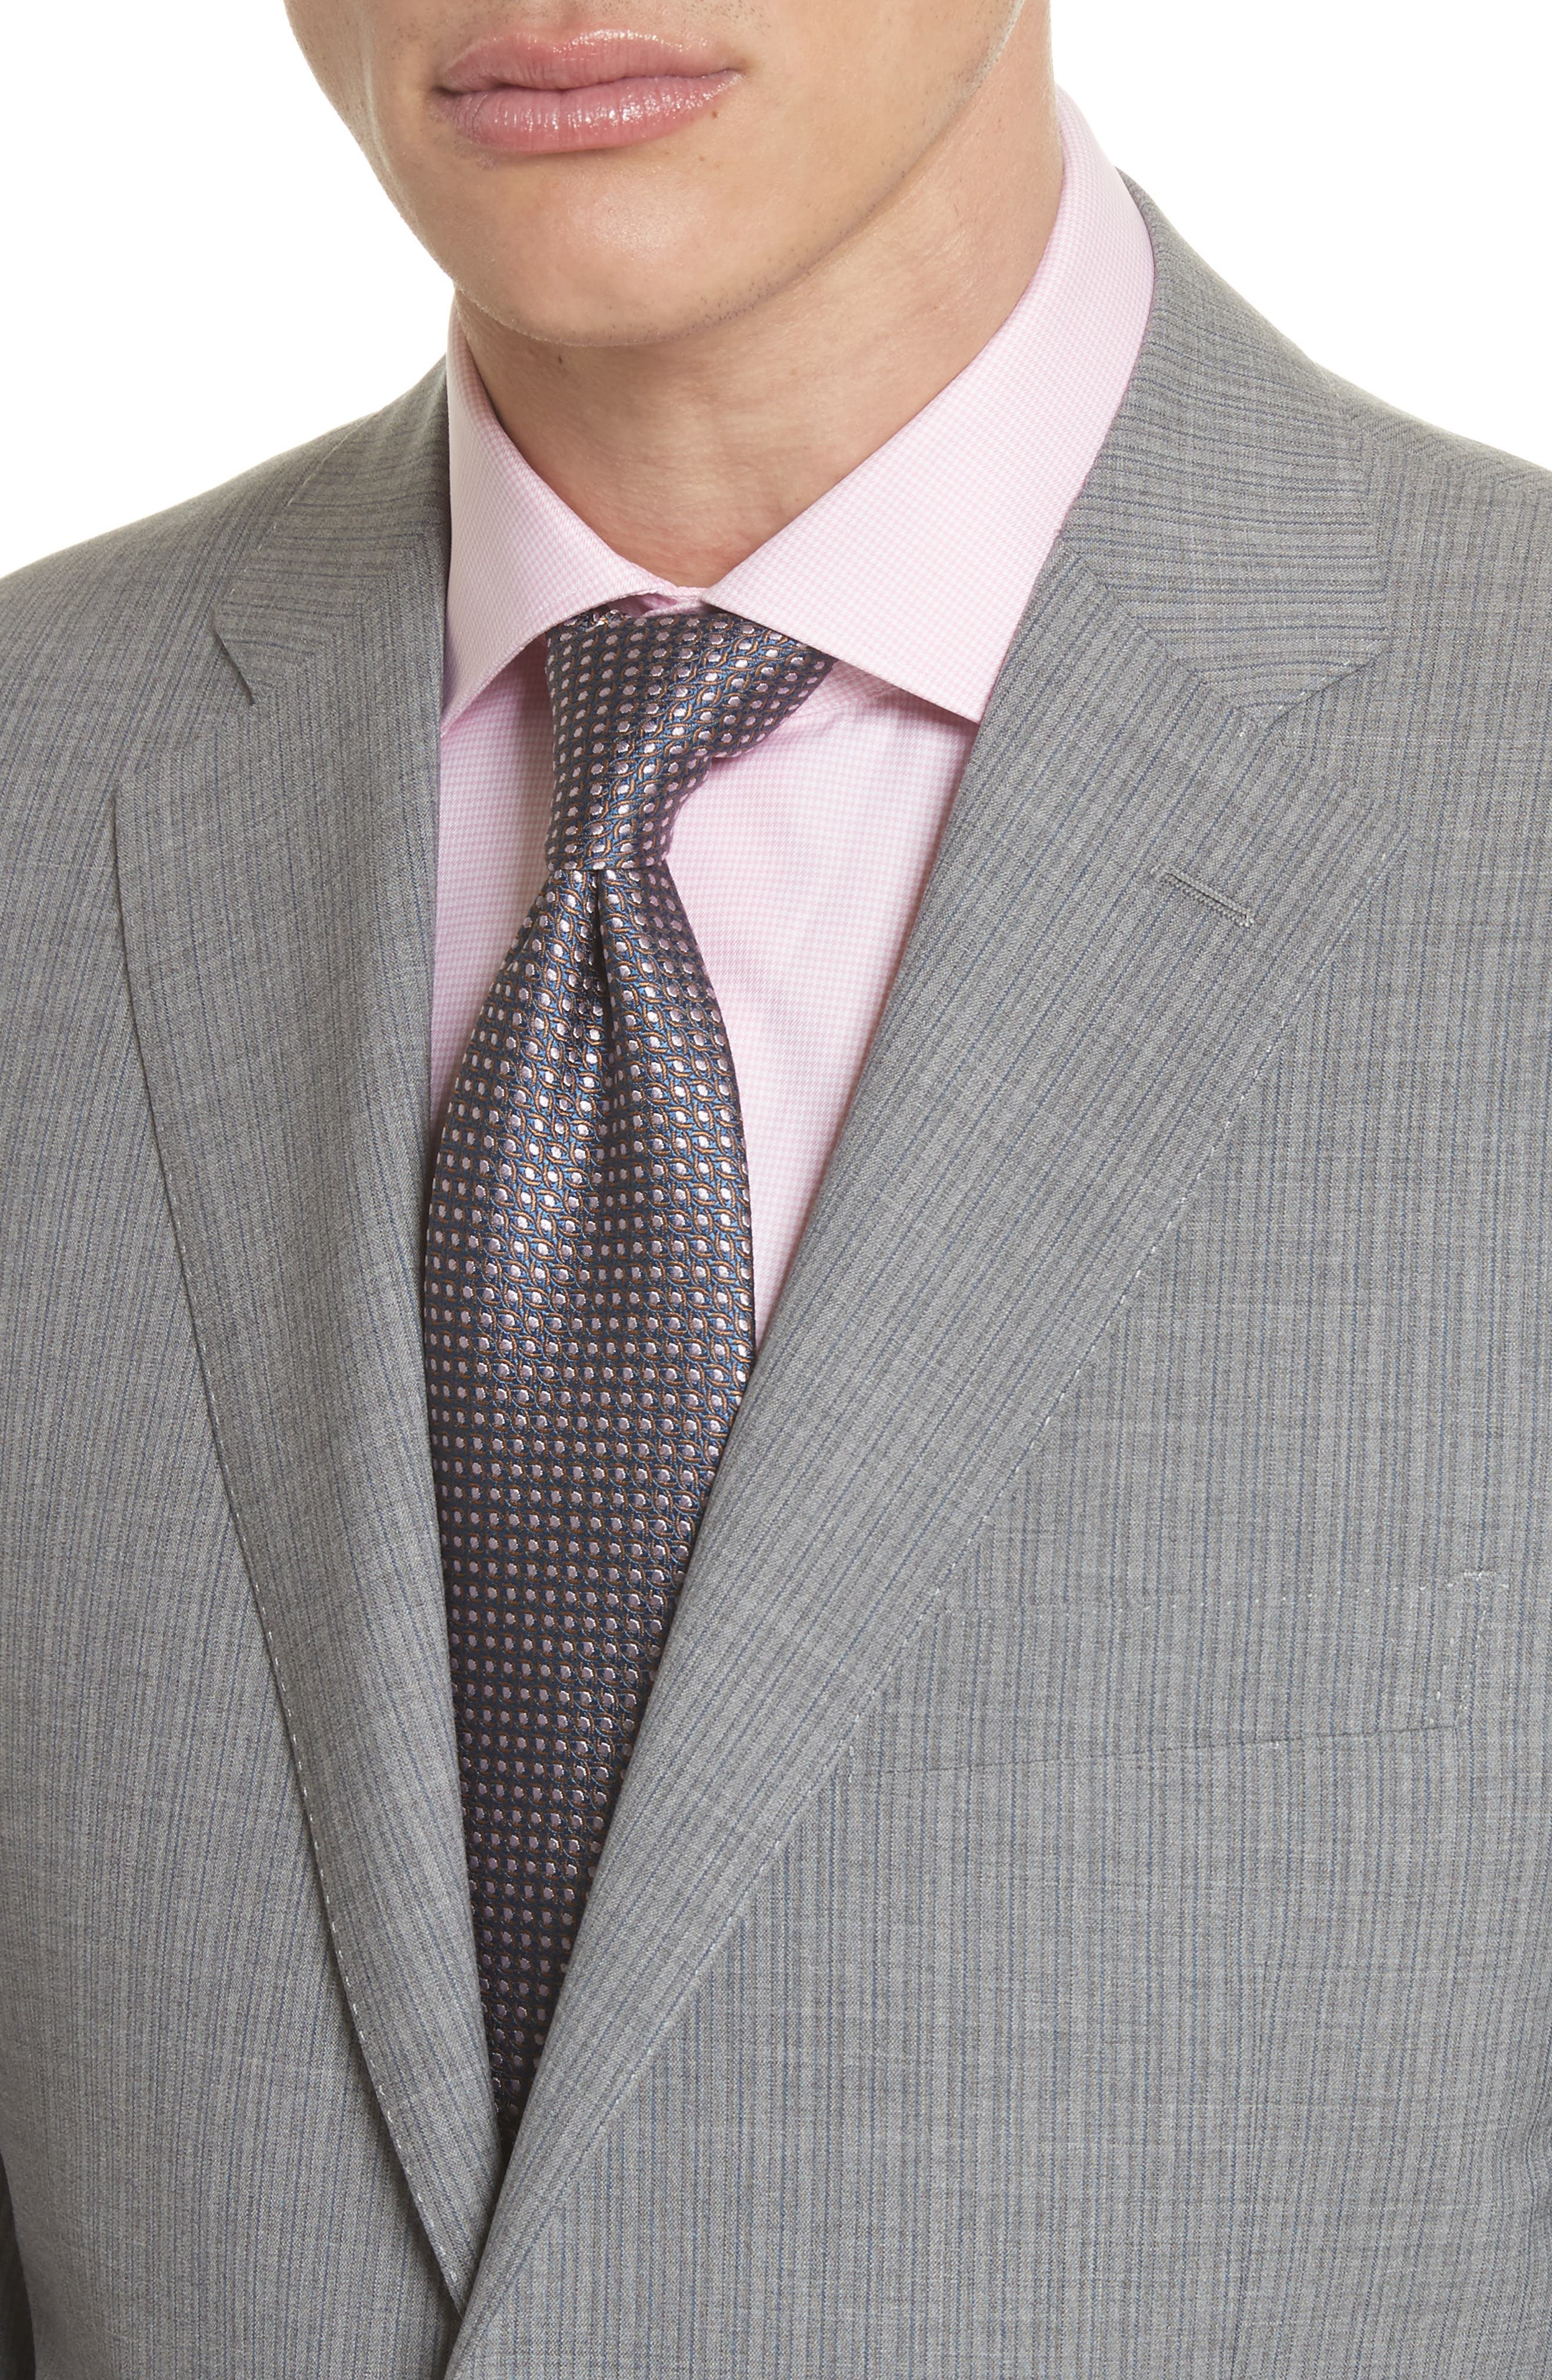 Classic Fit Stripe Wool Suit,                             Alternate thumbnail 6, color,                             Grey